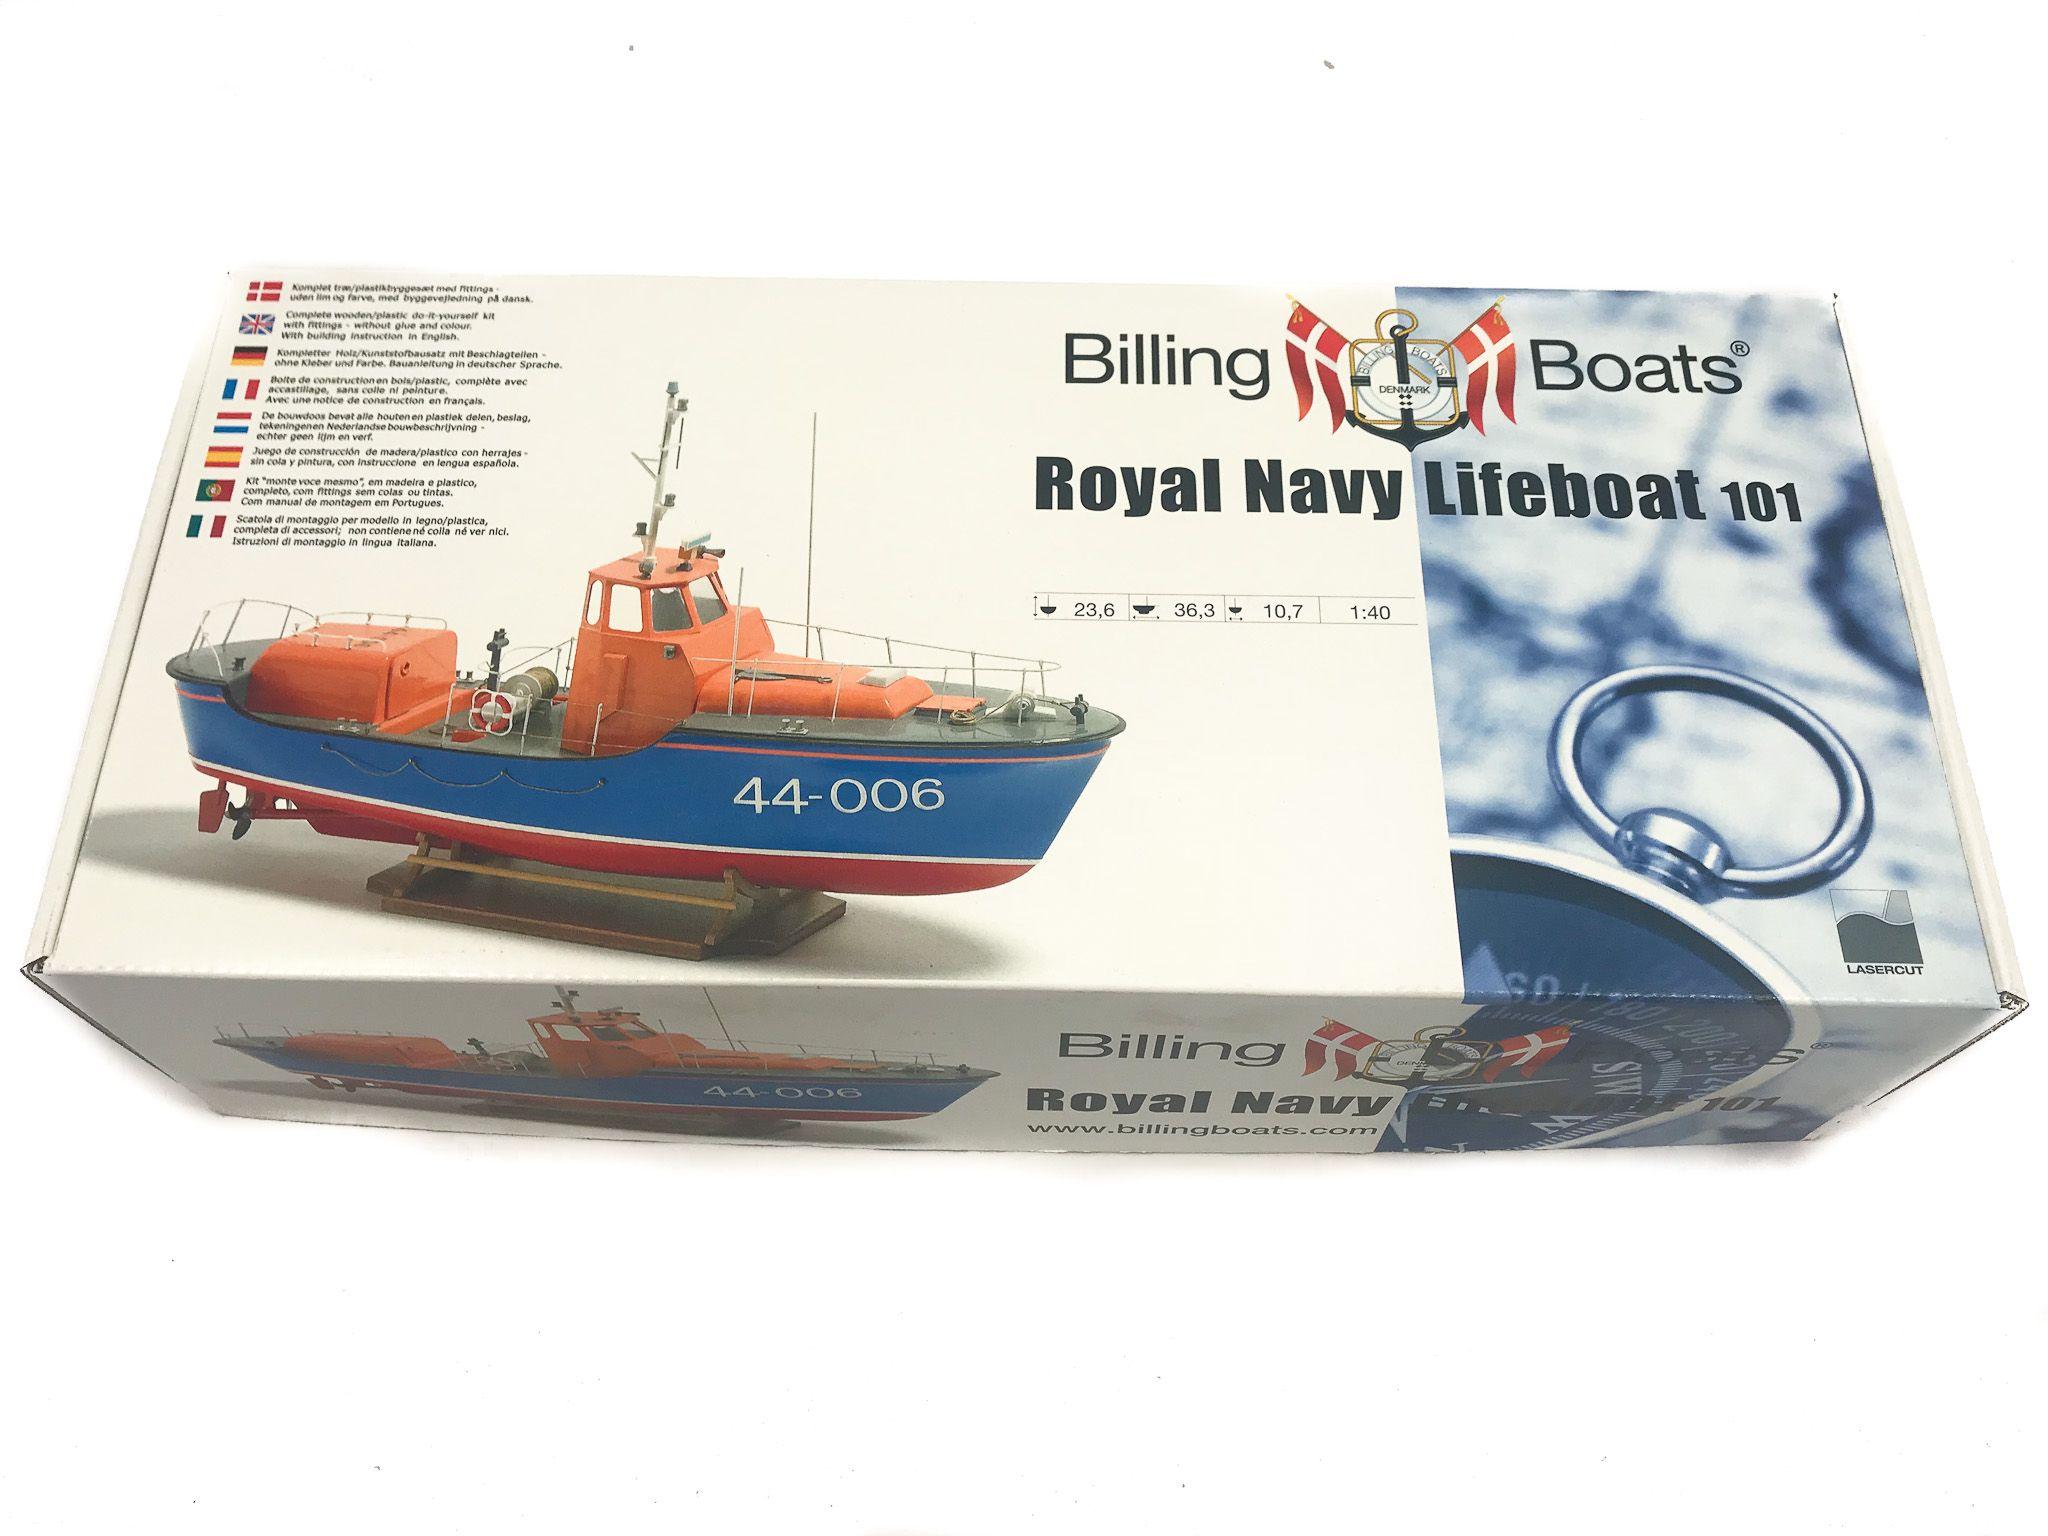 1043-12653-RNLI-Waveny-Lifeboat-Boat-Kit-Billing-Boats-B101